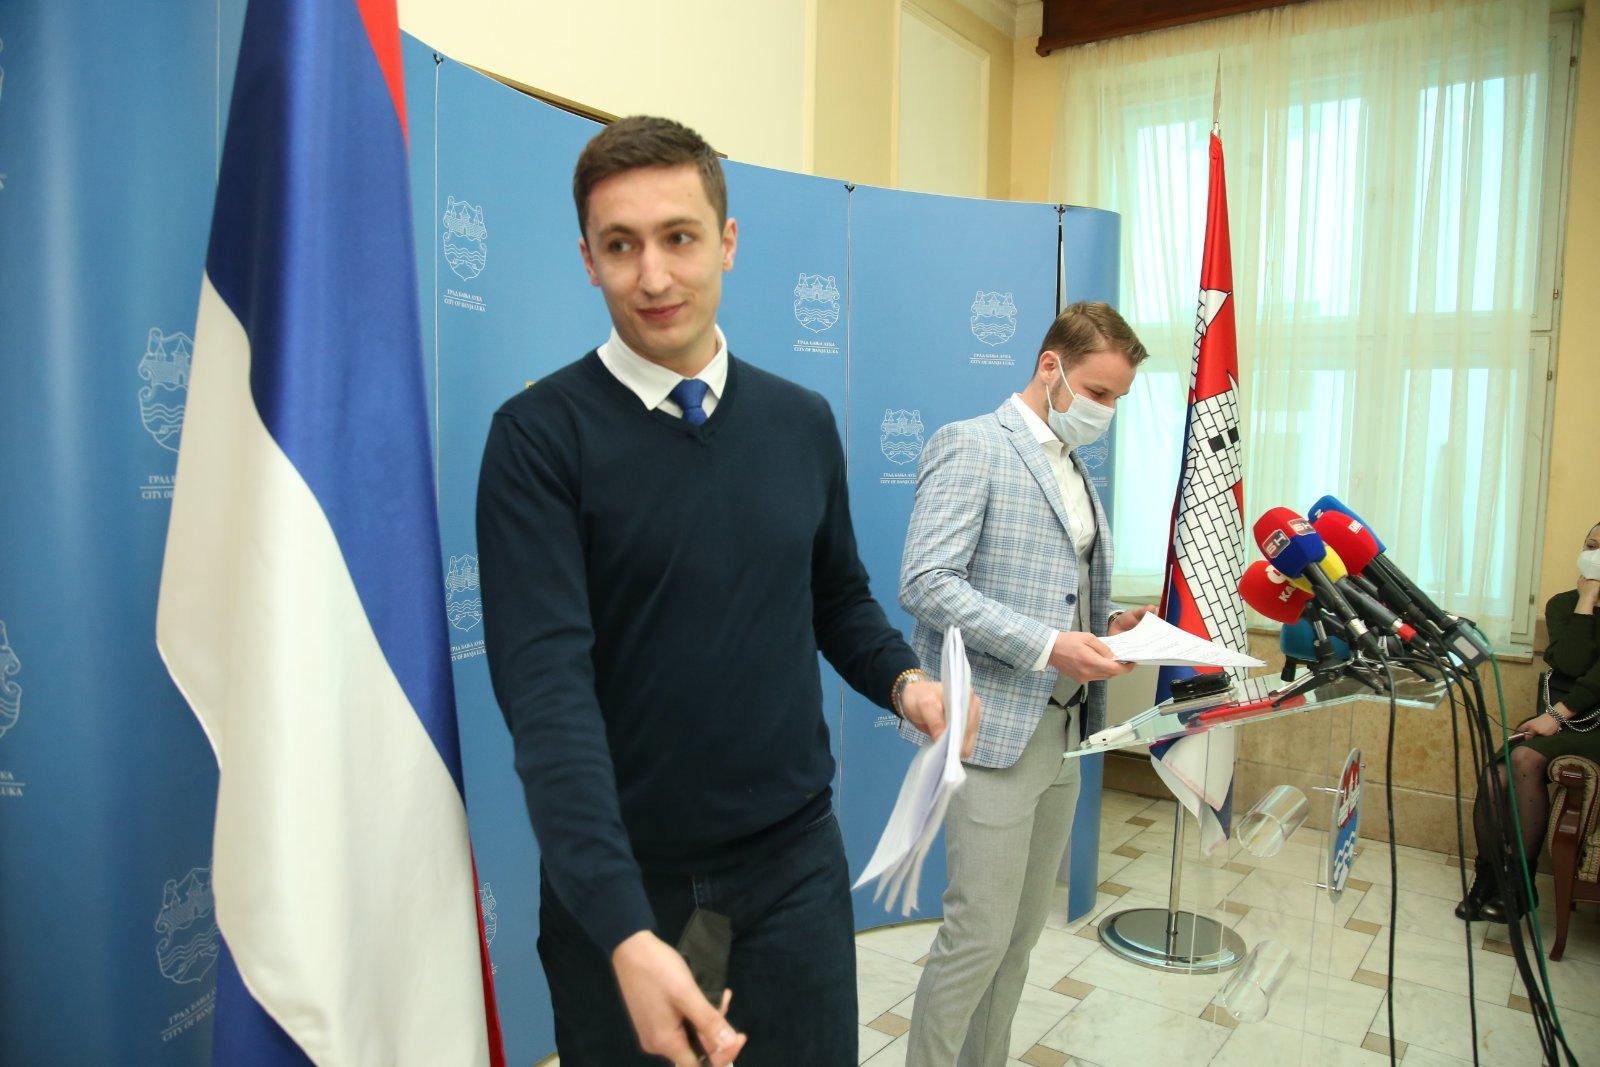 FOTO: Siniša Pašalić/RAS Srbija